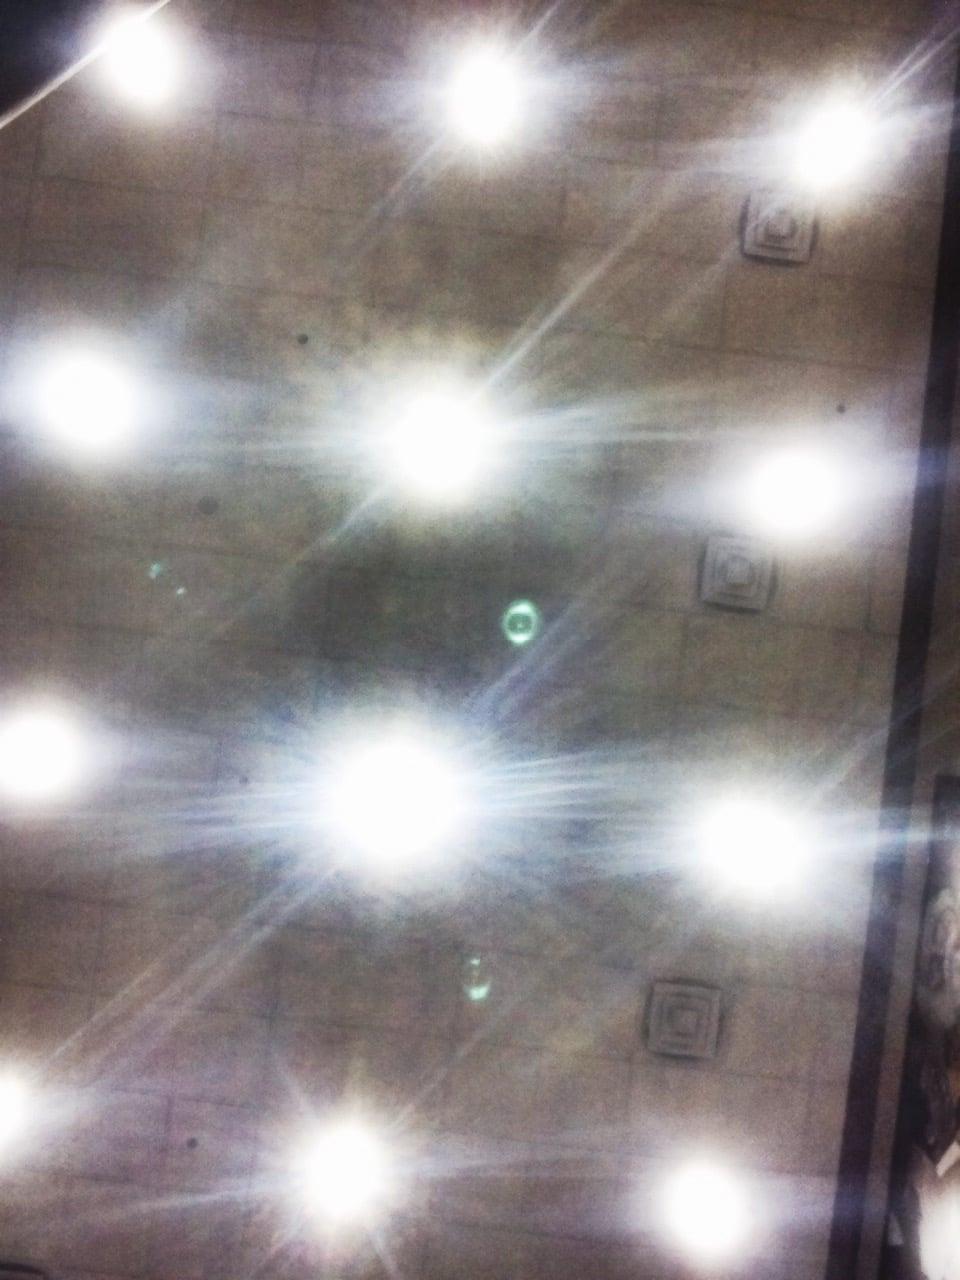 Cool lights at Barnes and Nobel